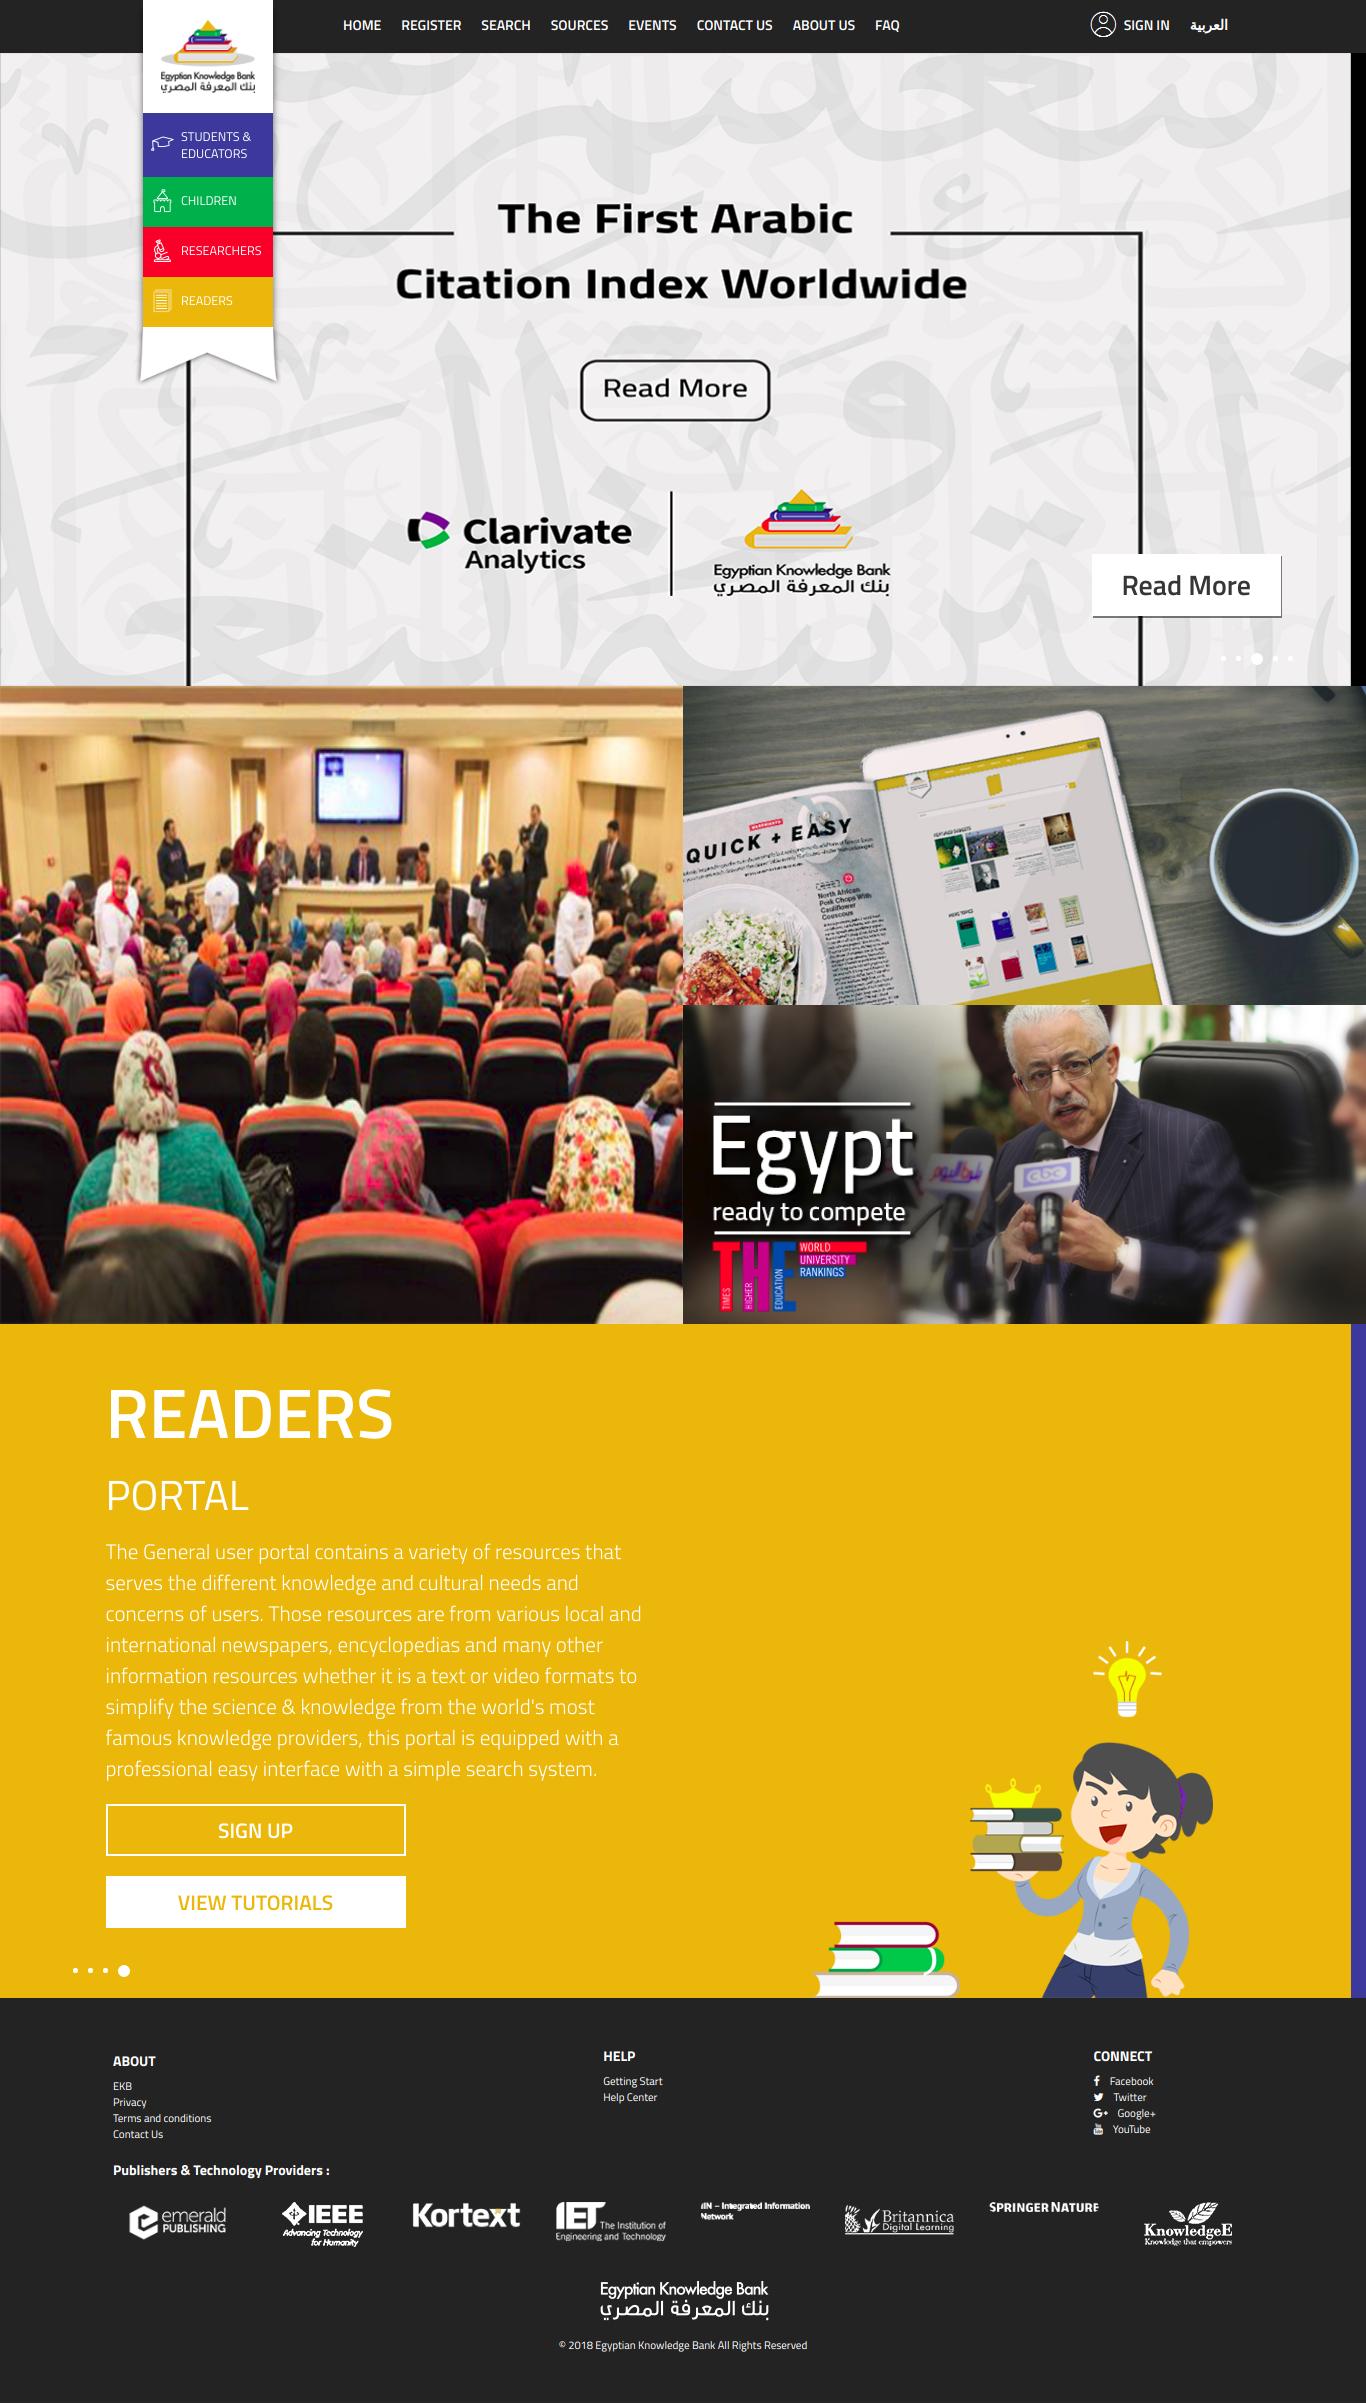 Egyptian Knowledge Bank